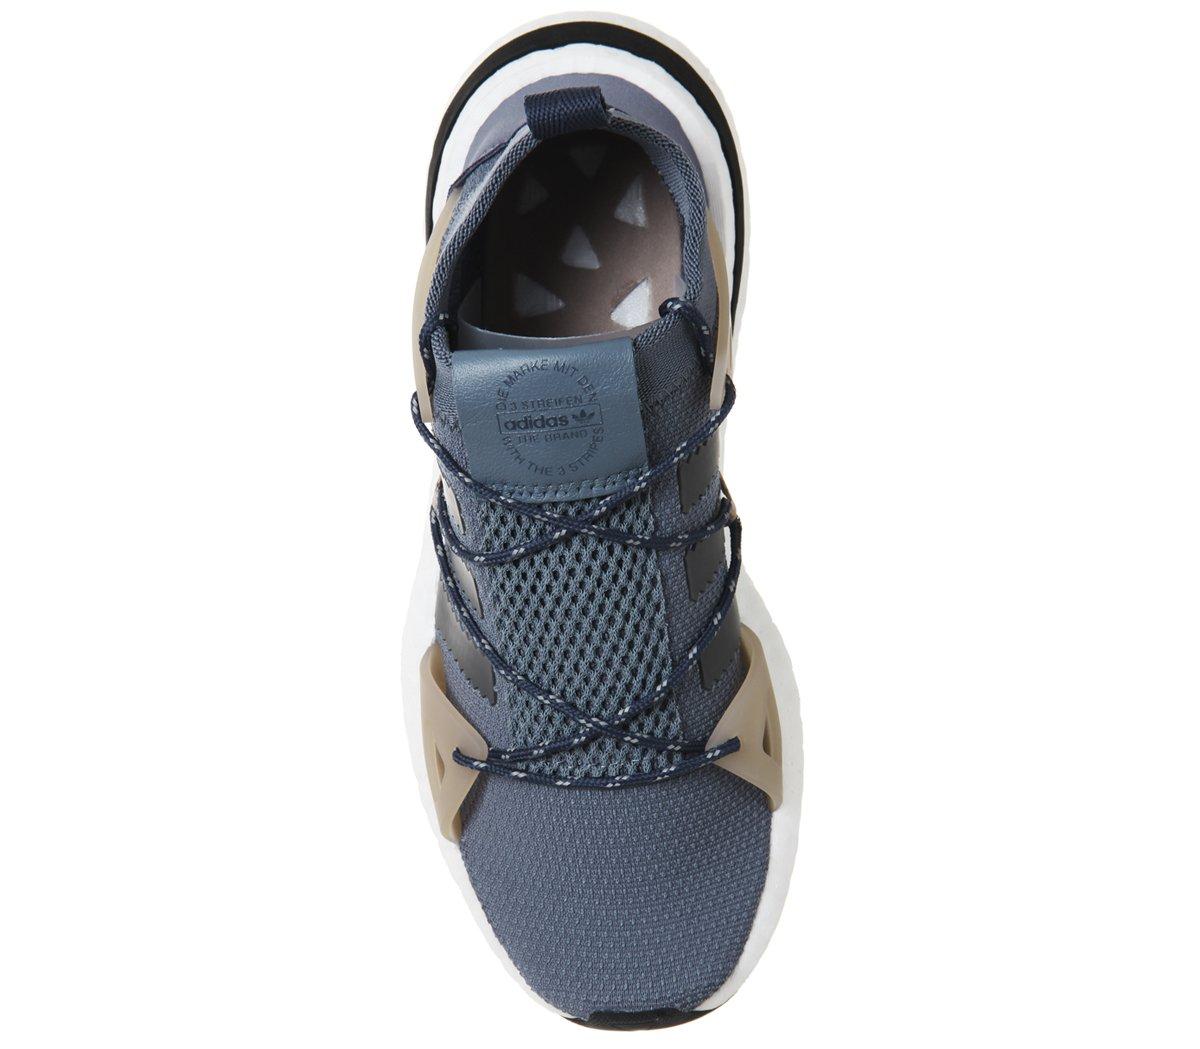 hommes / femmes femmes adidas arkyn w, femmes femmes de couleur, les femmes, ftwbla / ftwbla /% vg14309 moderne et solide qualité élégant Hommes u 19eeef